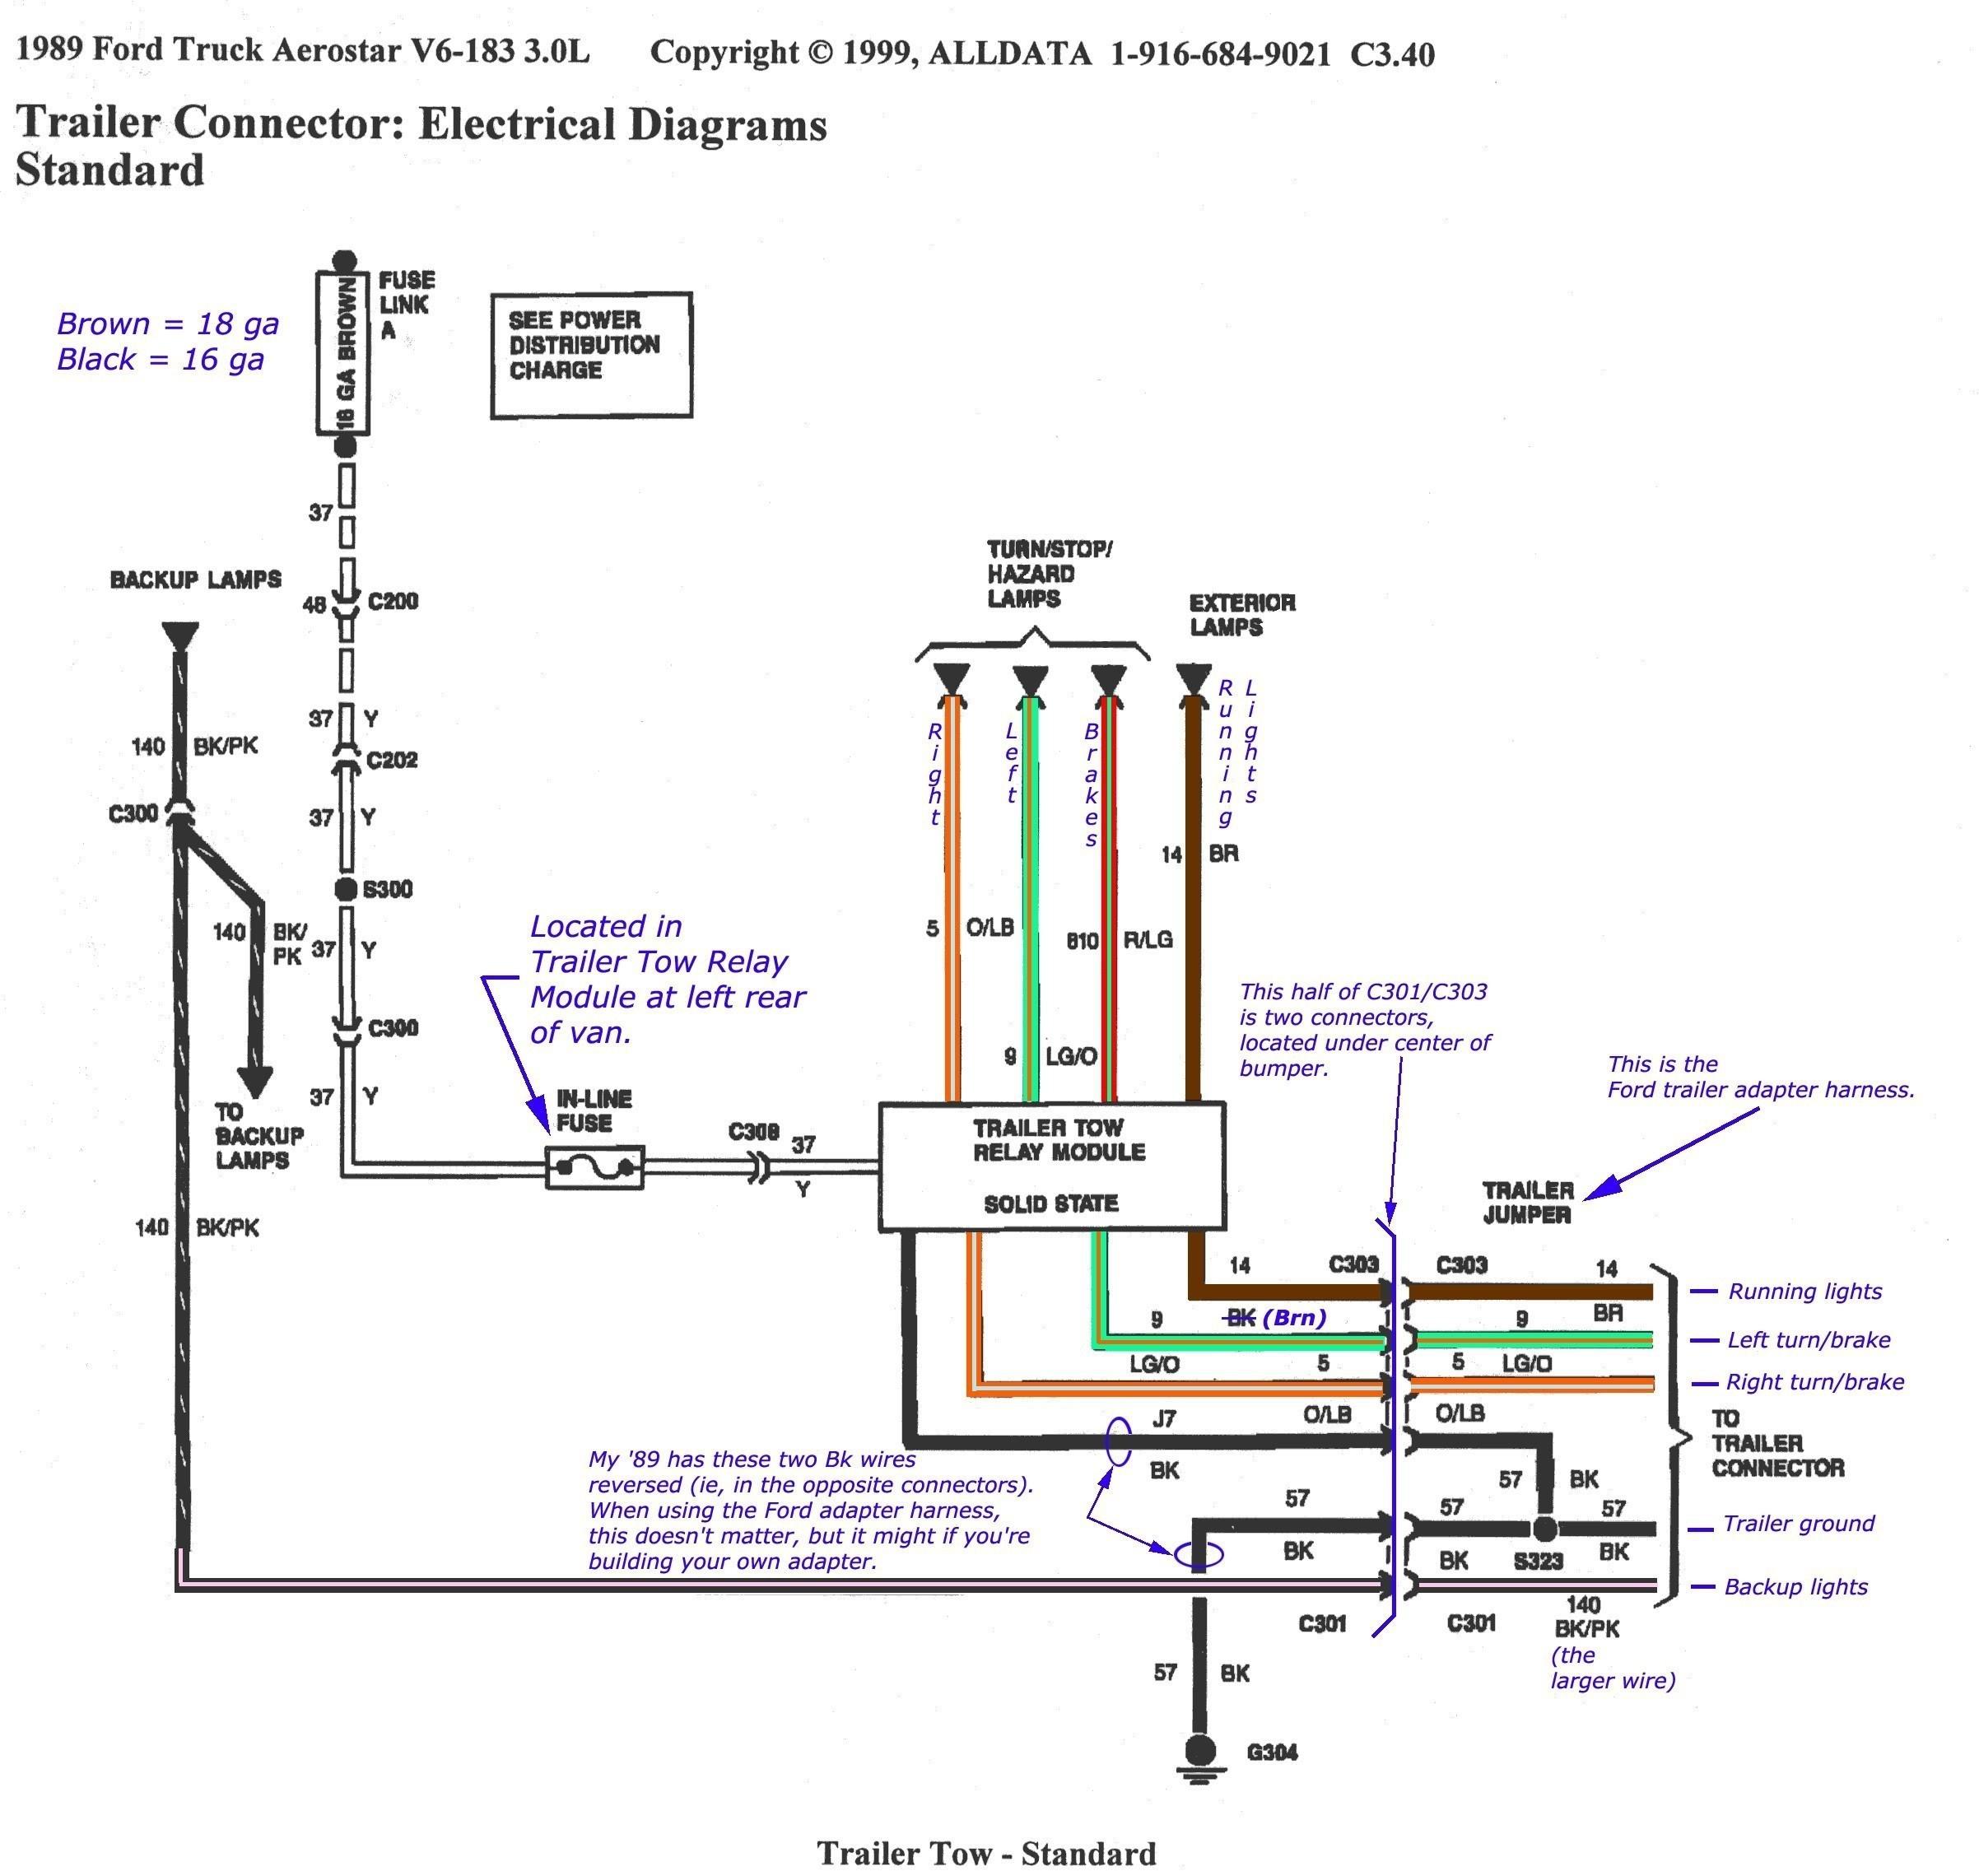 Car Trailer Wire Diagram Mercial Trailer Wiring Diagram Diagrams for Utility Best Od Rv Of Car Trailer Wire Diagram